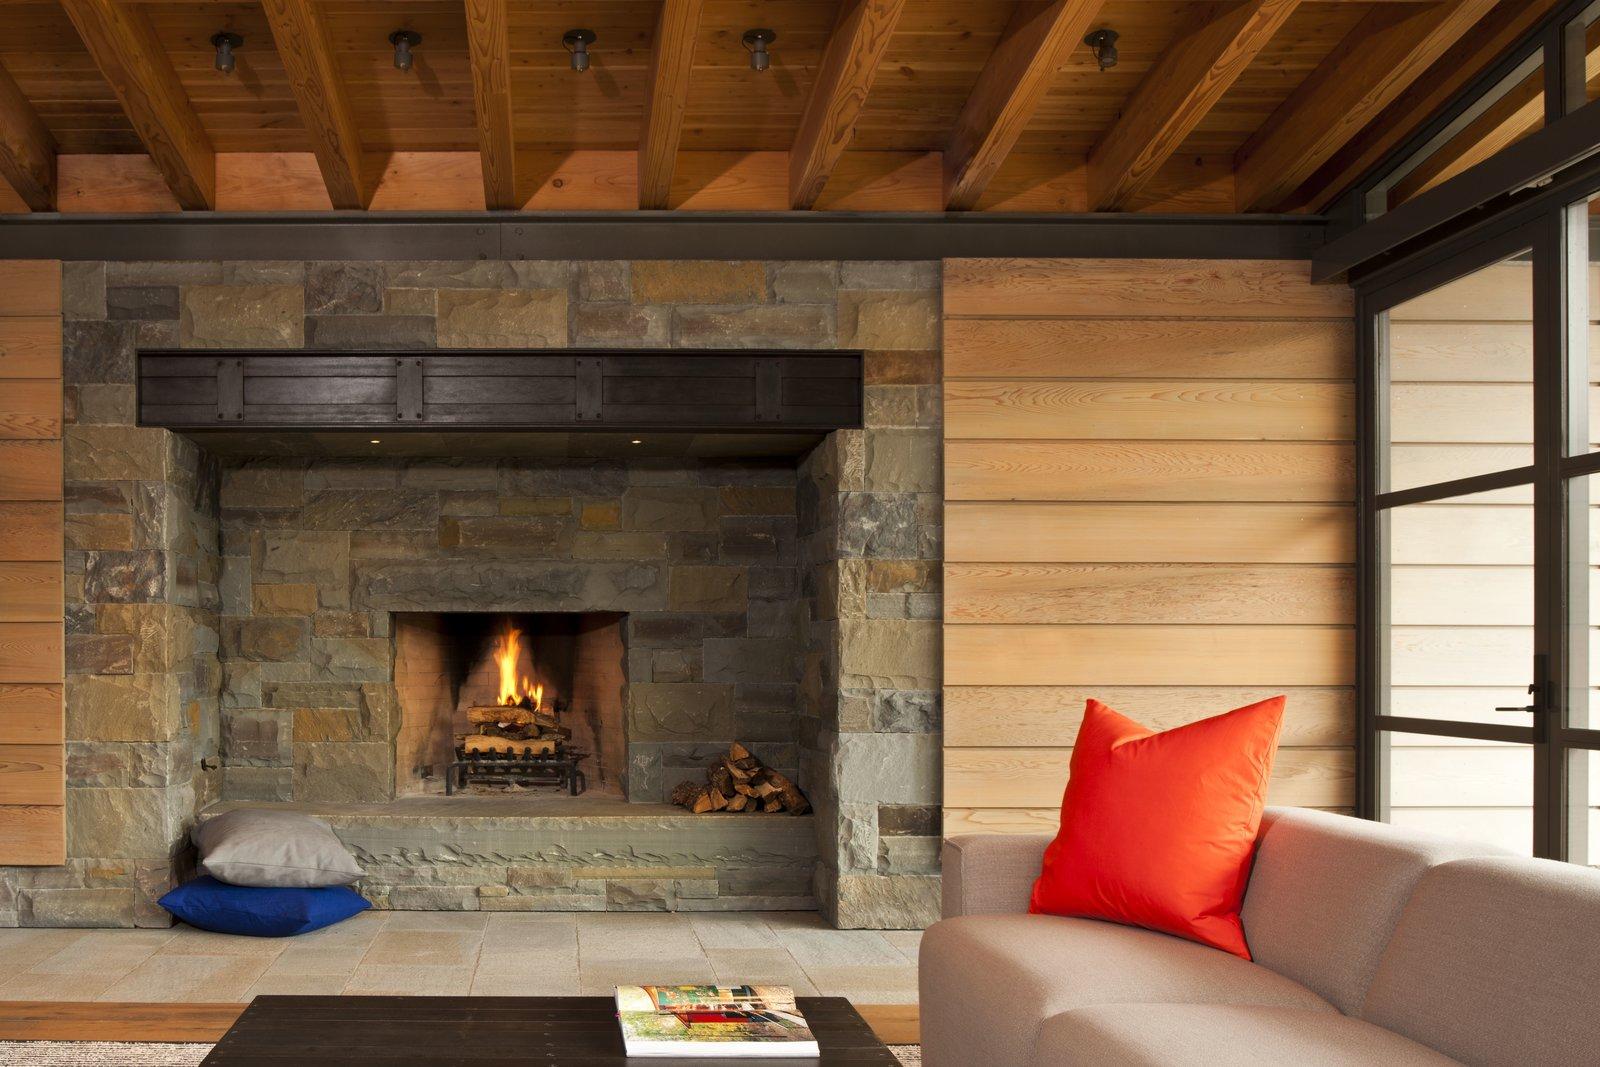 Living Room, Wood Burning Fireplace, Coffee Tables, Light Hardwood Floor, and Sectional  Halls Ridge Knoll by Bohlin Cywinski Jackson